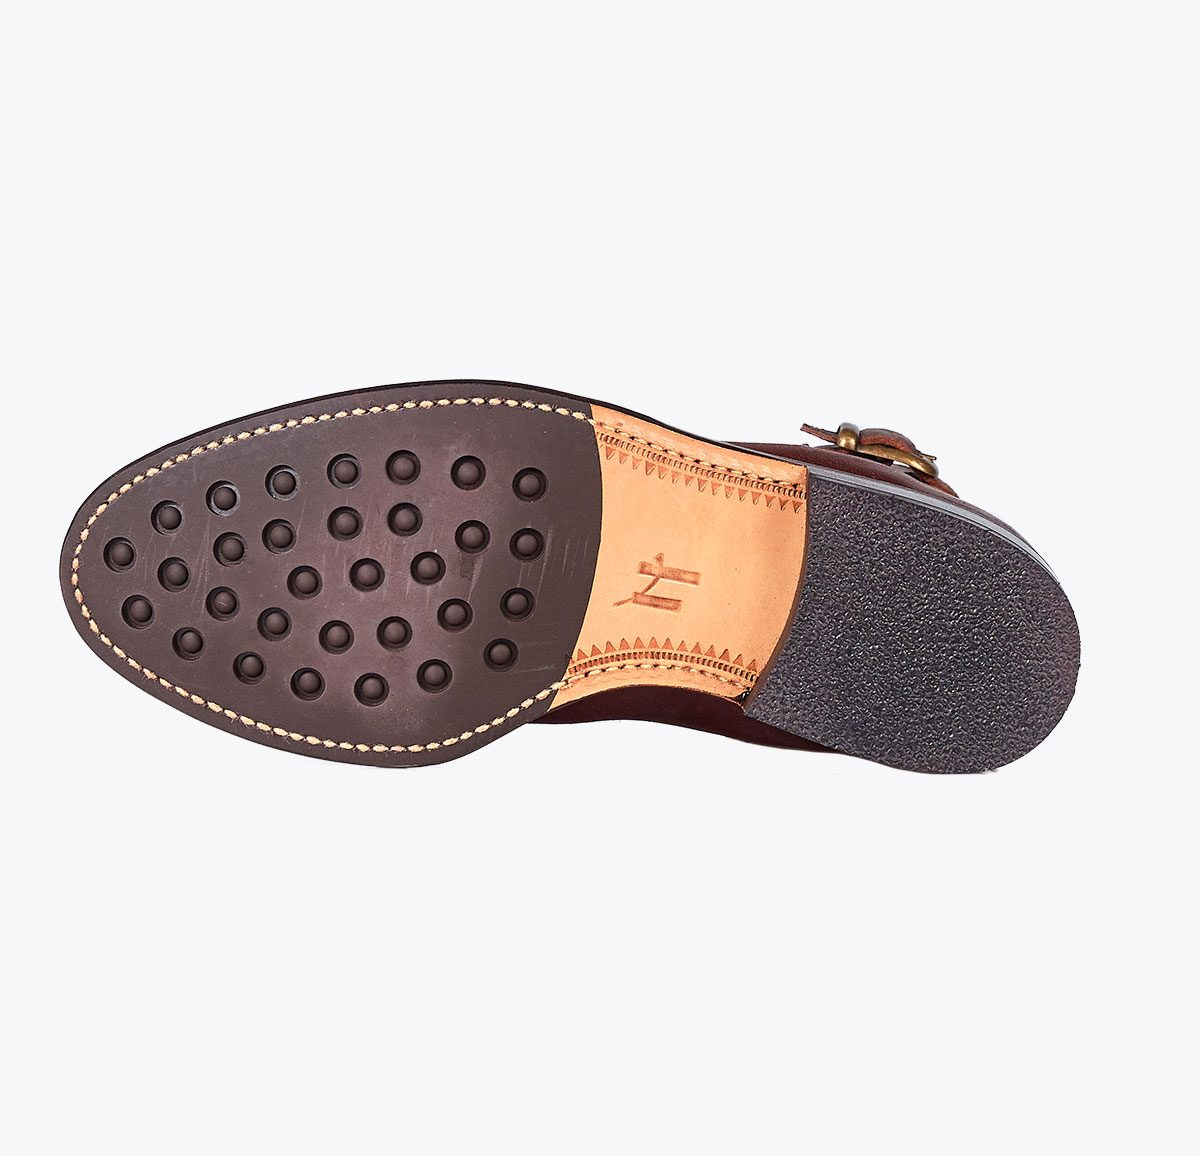 Botín Moldeada hebilla, tailor made shoes, schuhe nach mass en mandalashoes Santanyí Mallorca